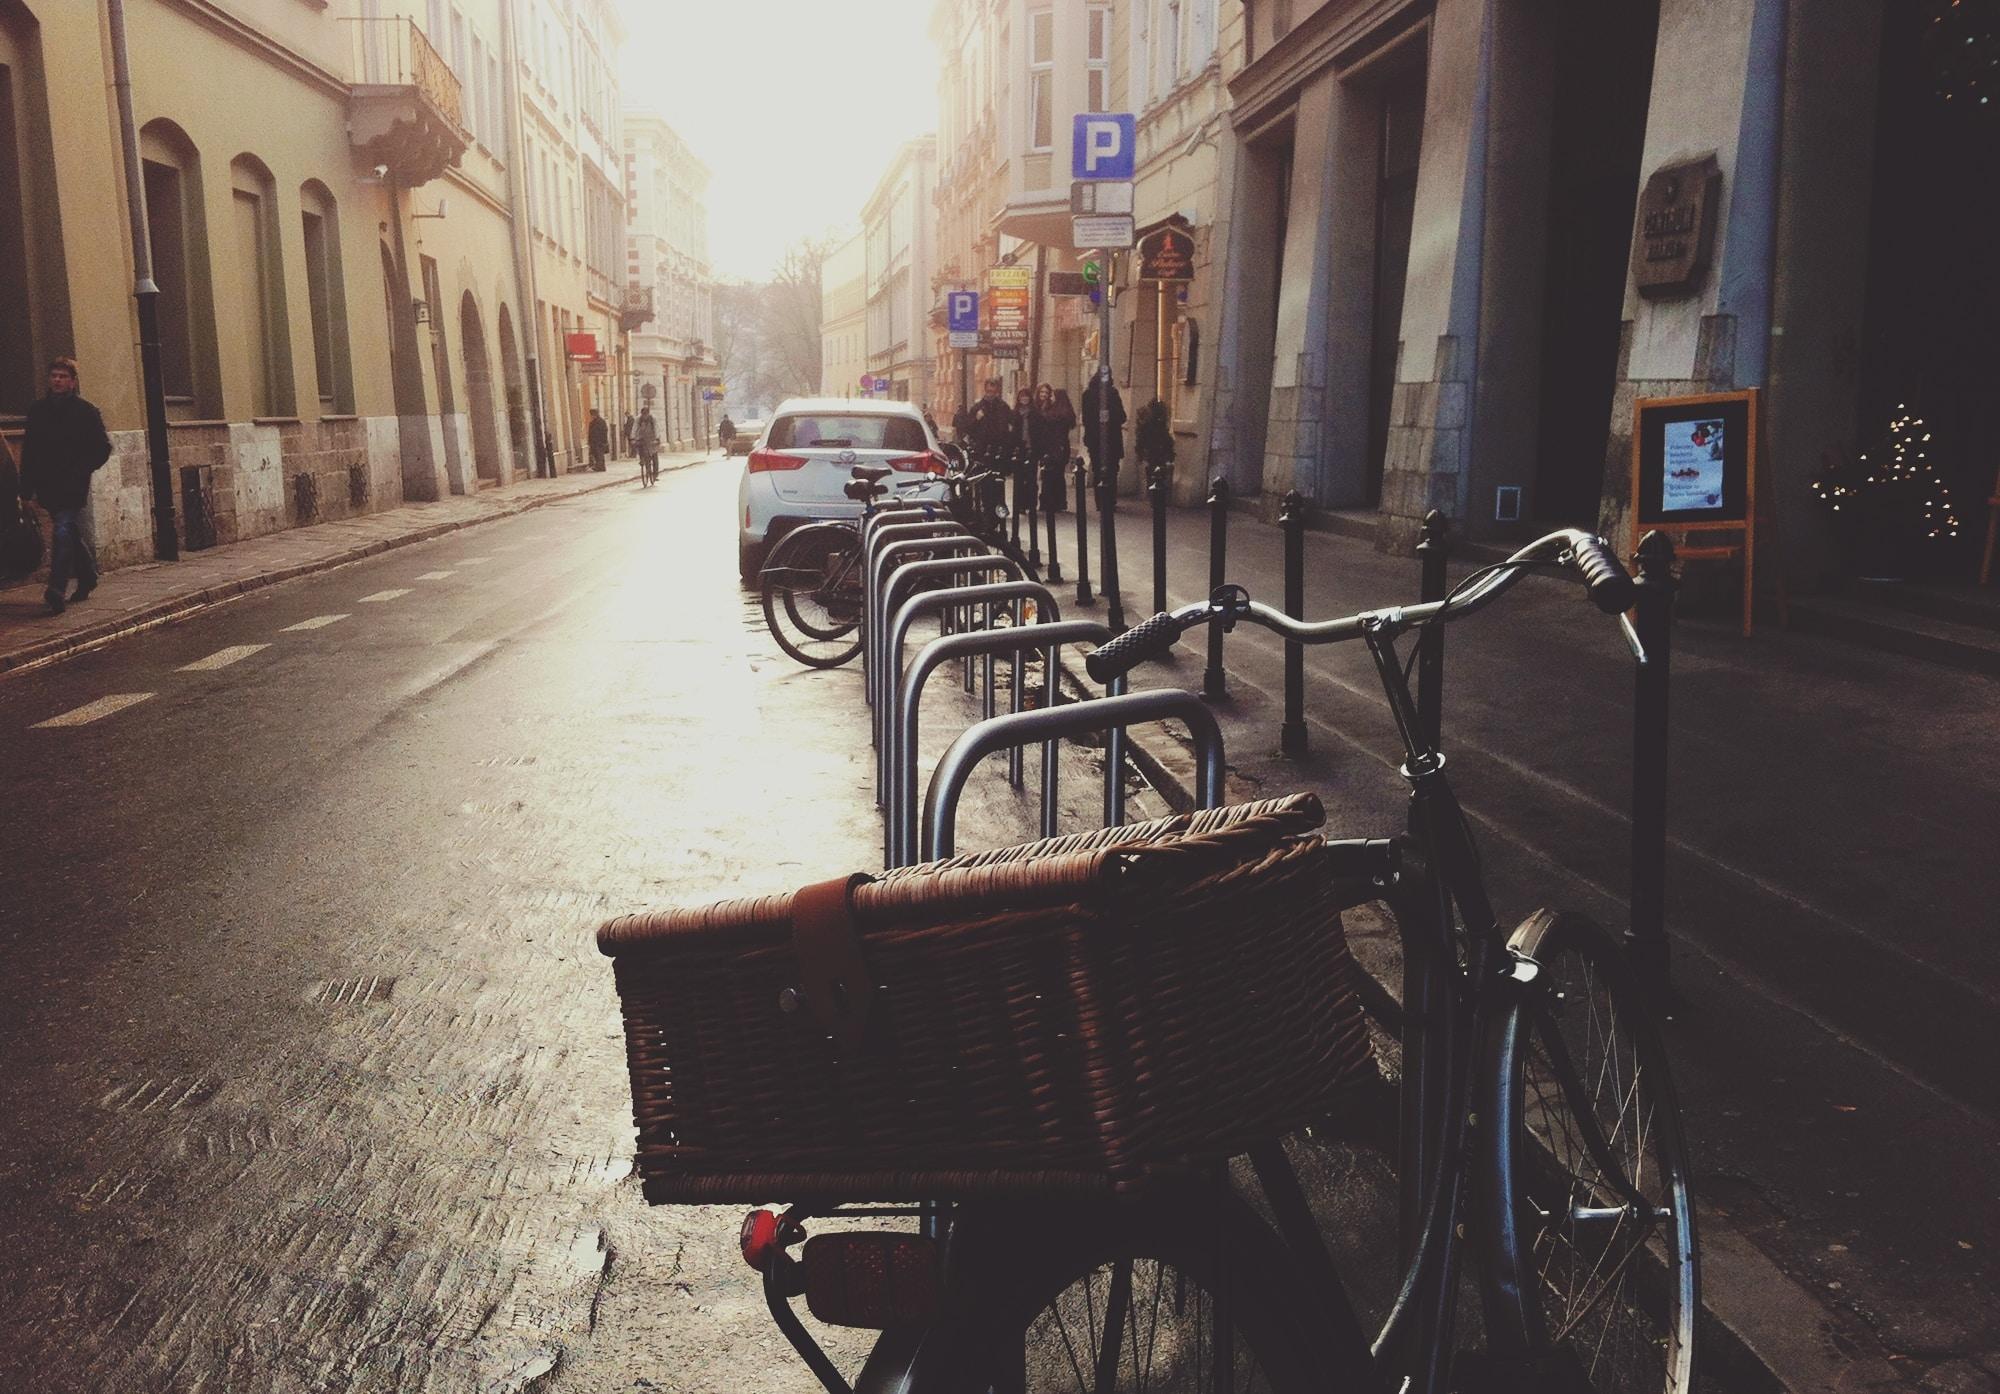 bicycle macro photography during daytime